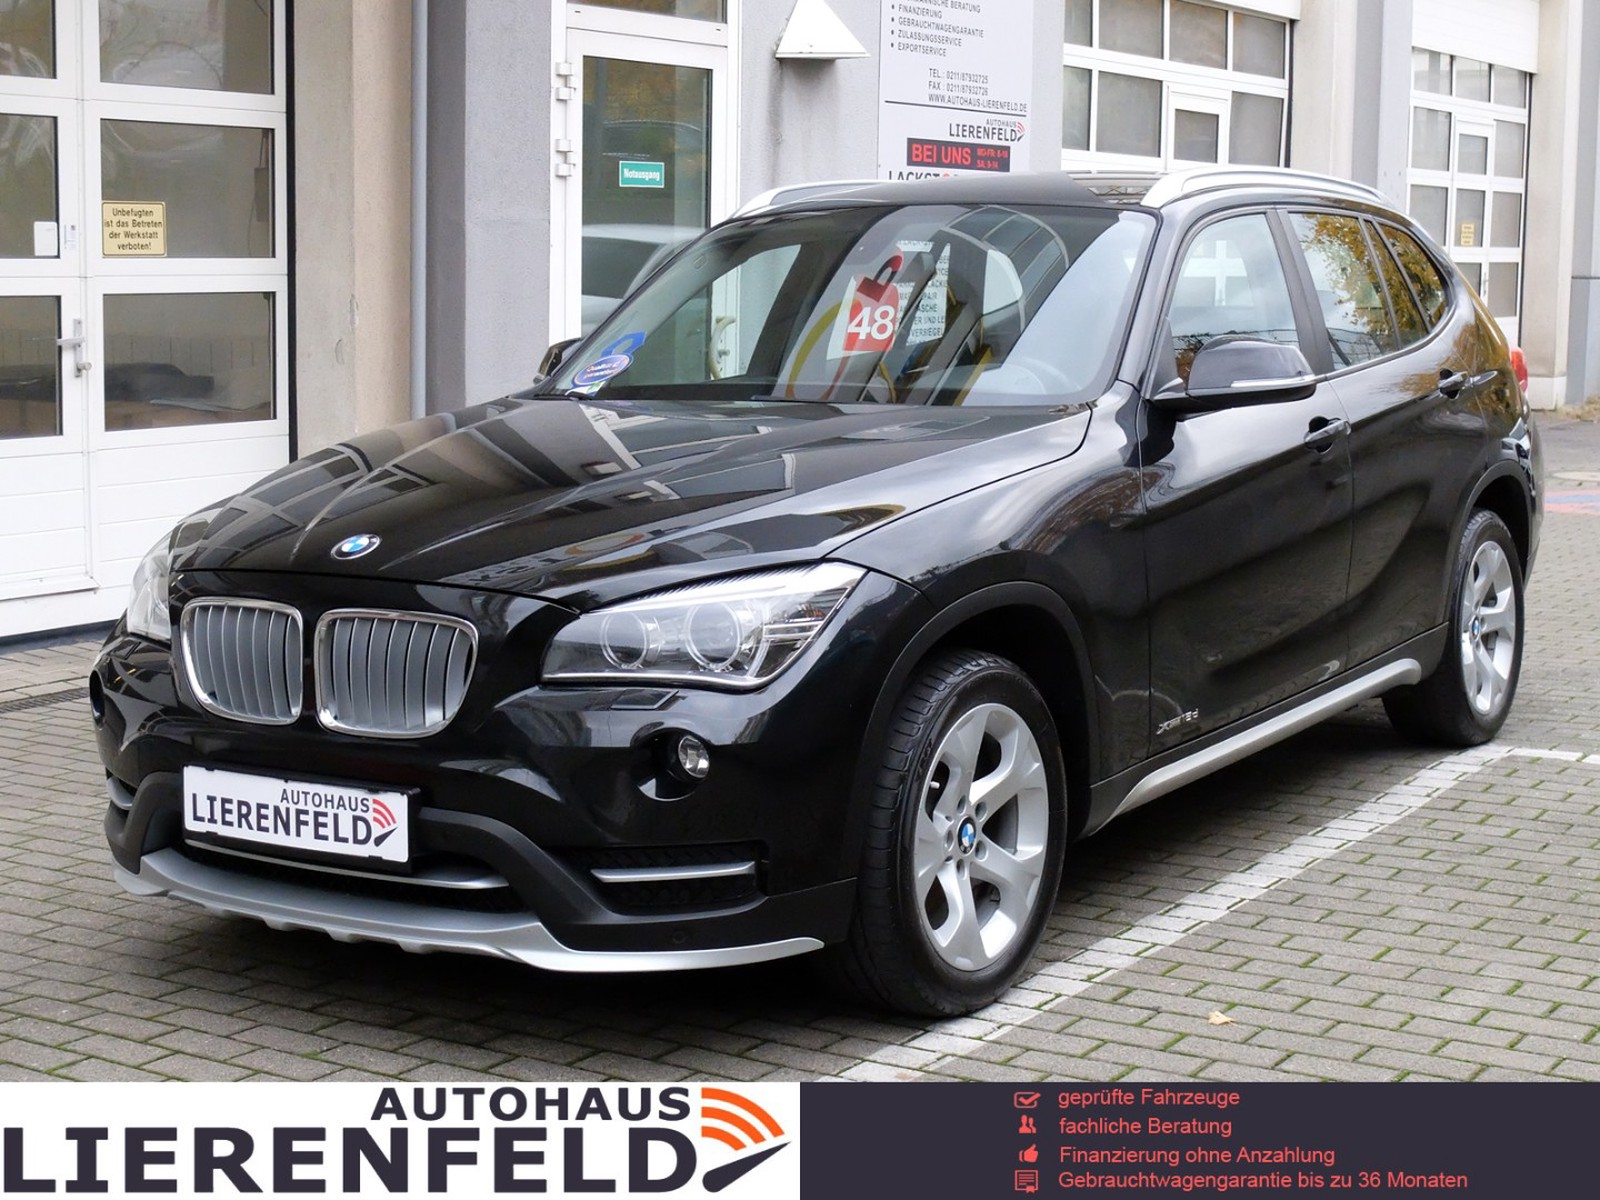 BMW X20 xDrive 208d used buy in Düsseldorf Price 203490 eur   Int.Nr ...